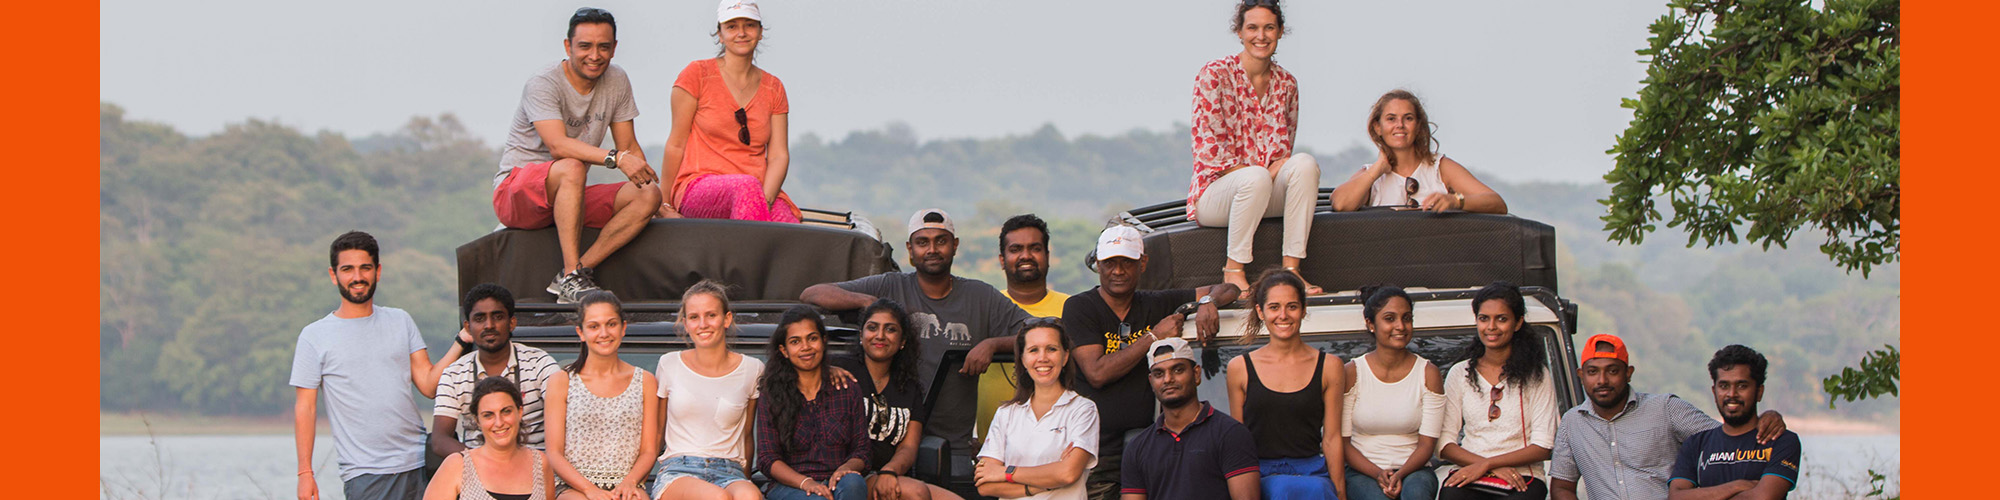 L'équipe Mai Globe Travels au parc national de Minneriya